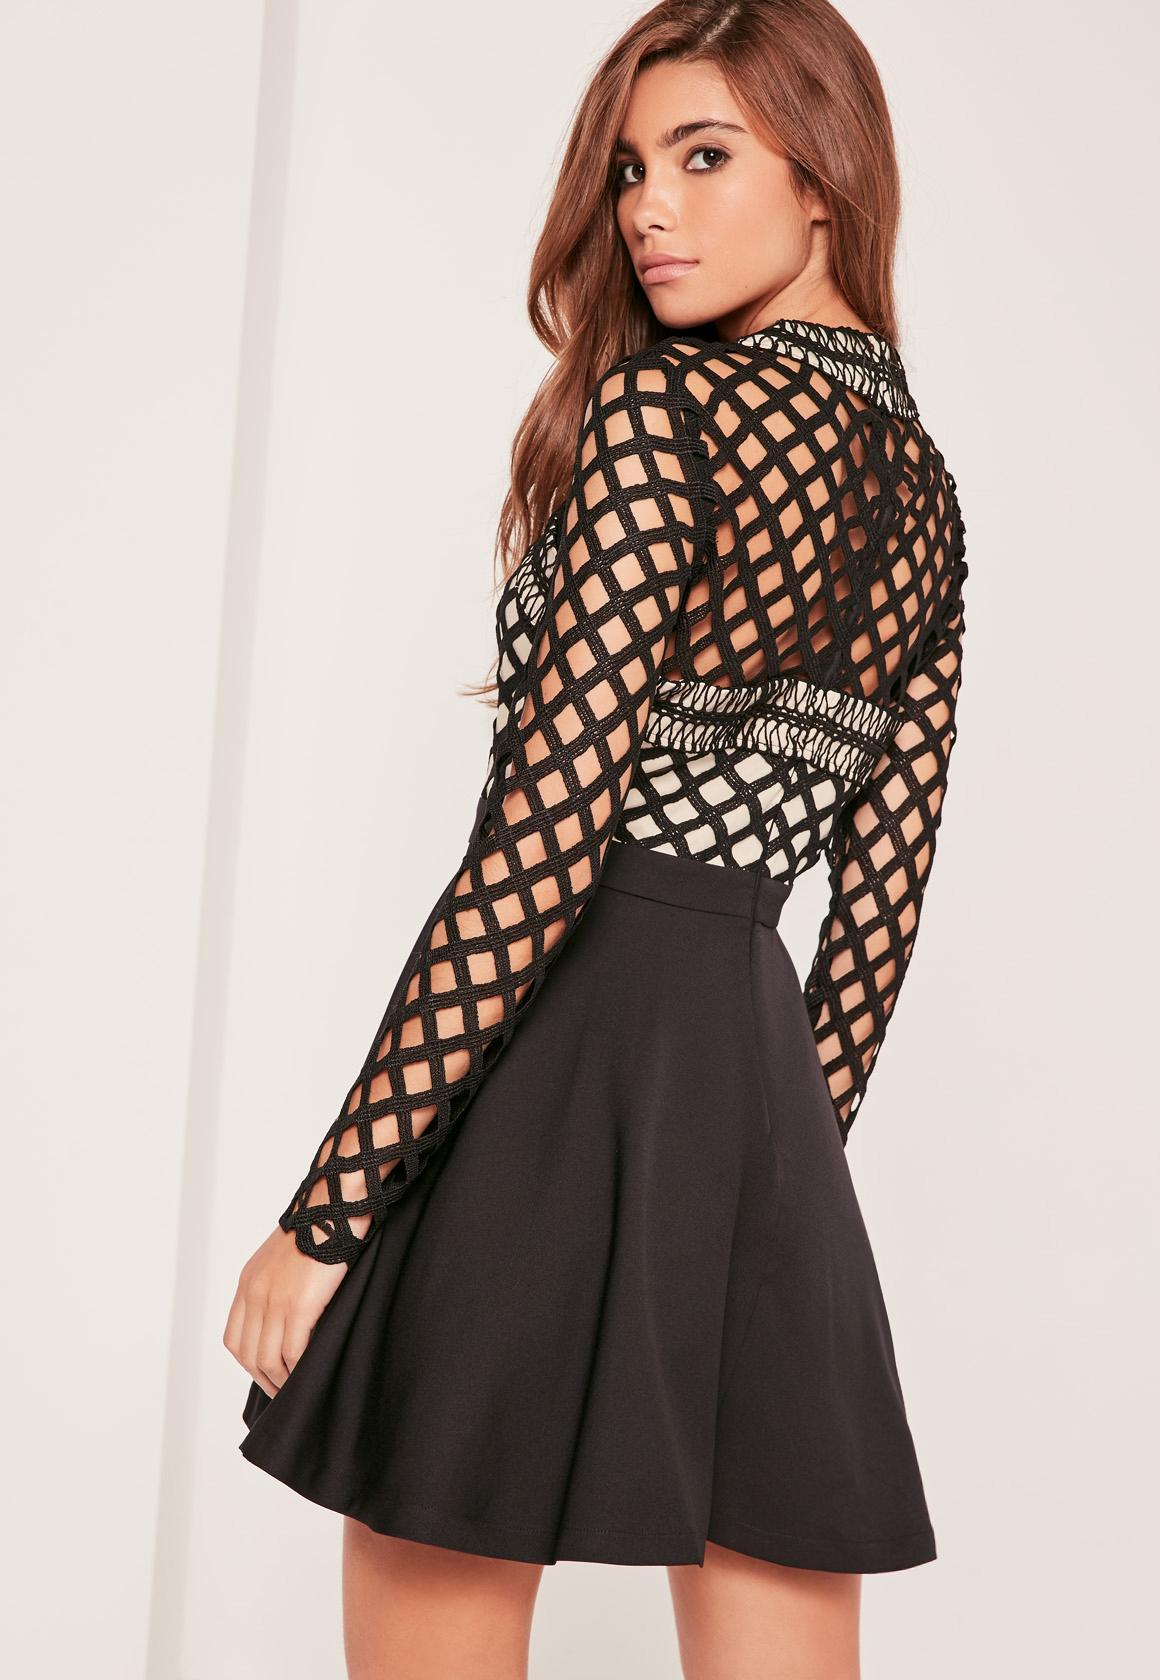 Black Lace Cross Front Skater Dress